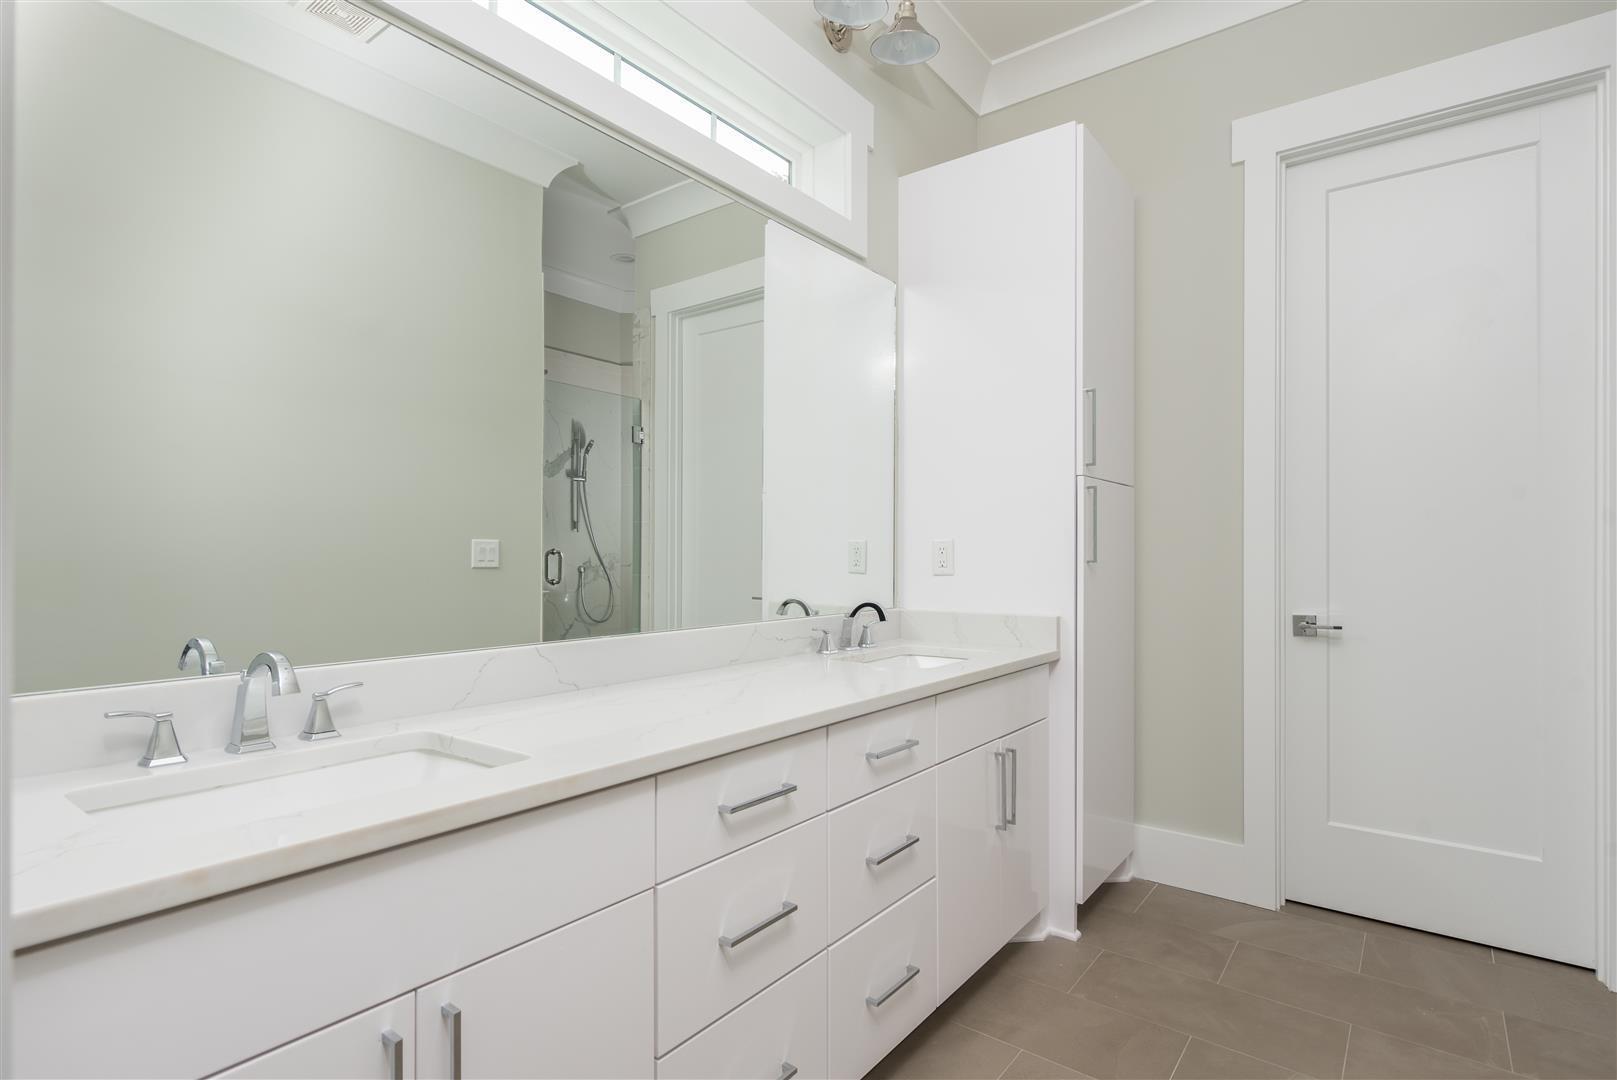 Scanlonville Homes For Sale - 160 5th, Mount Pleasant, SC - 11